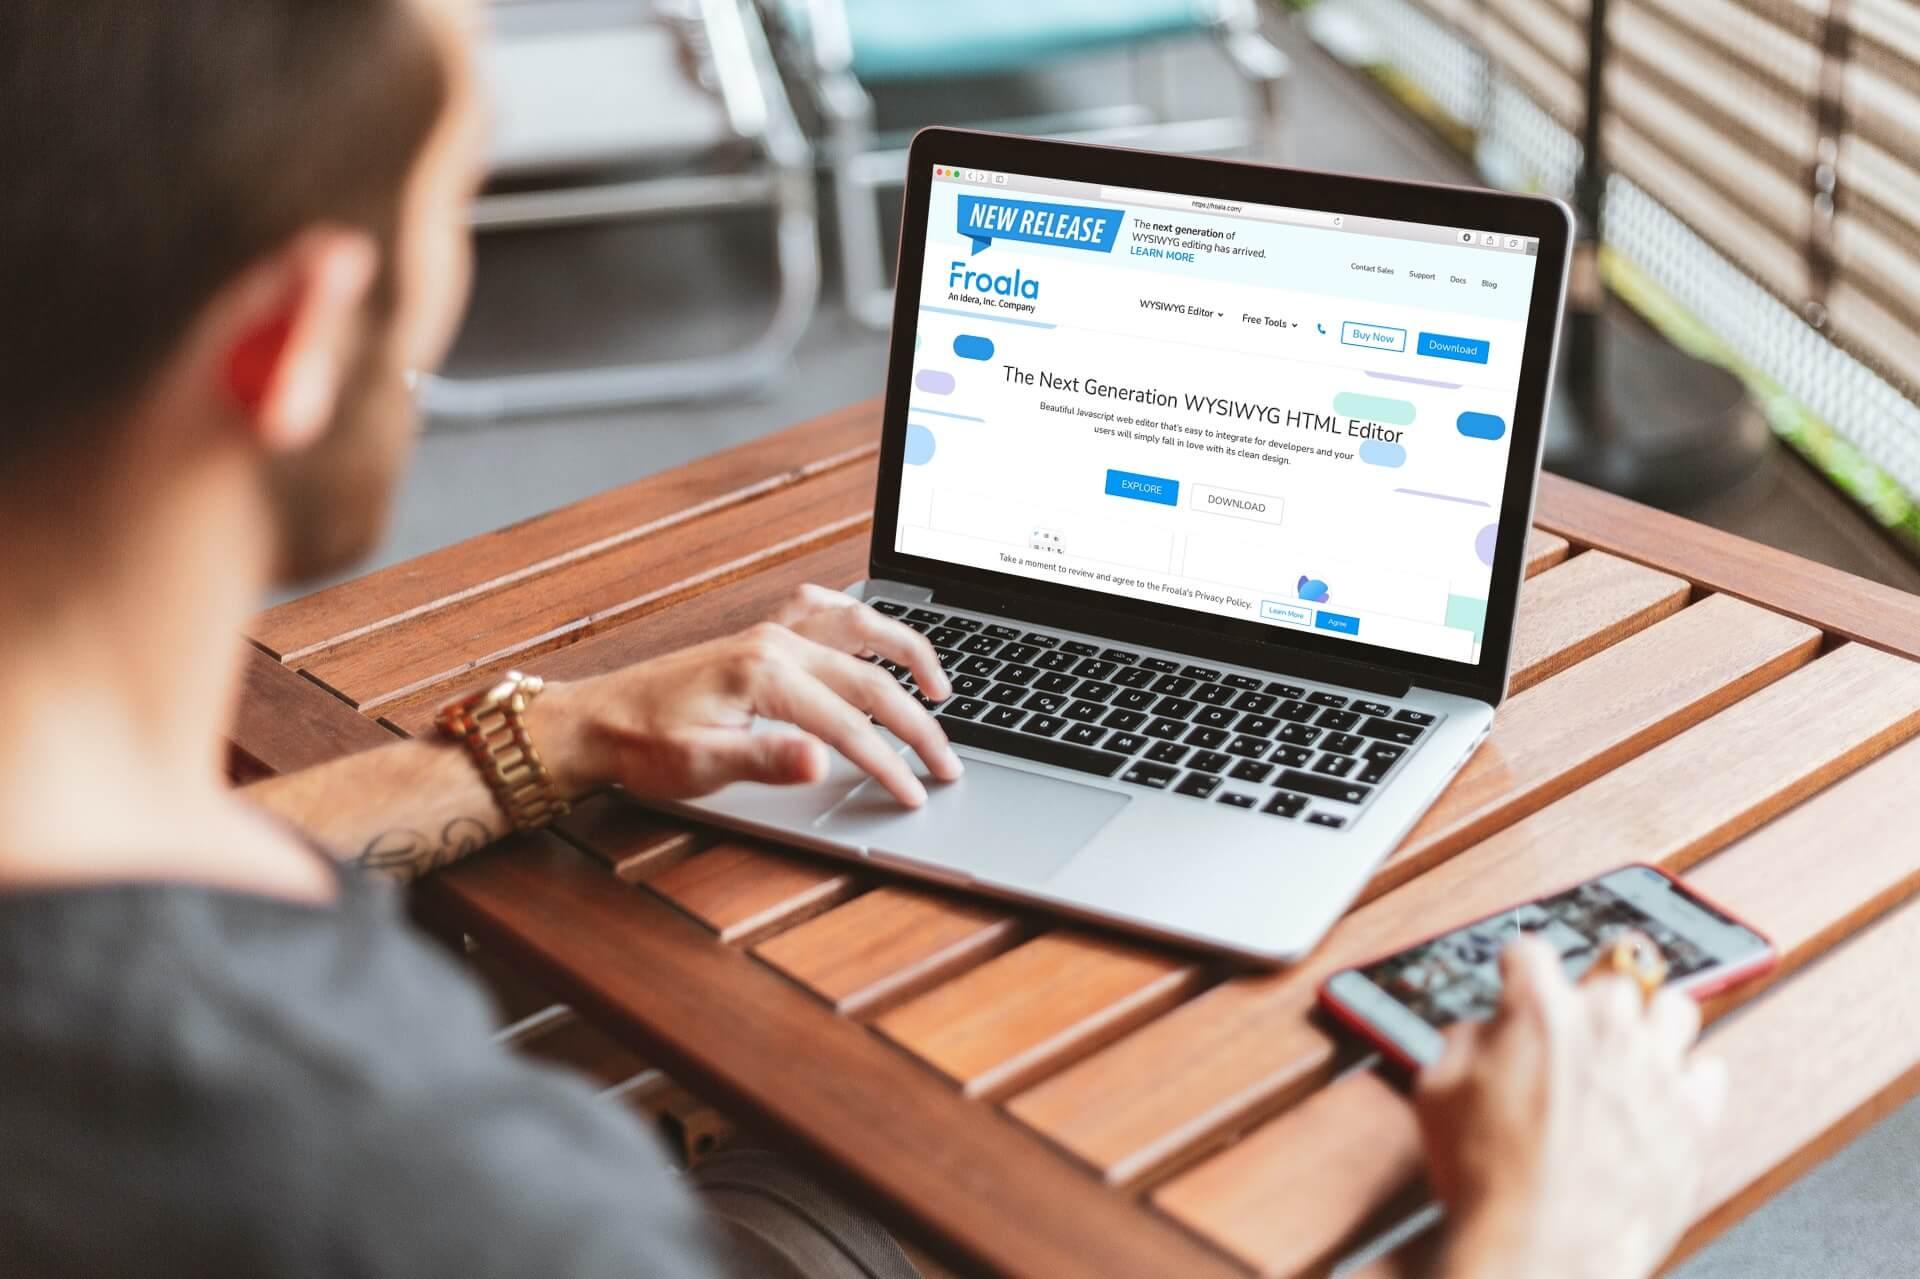 Choosing between Froala and ContentTools WYSWYG editor